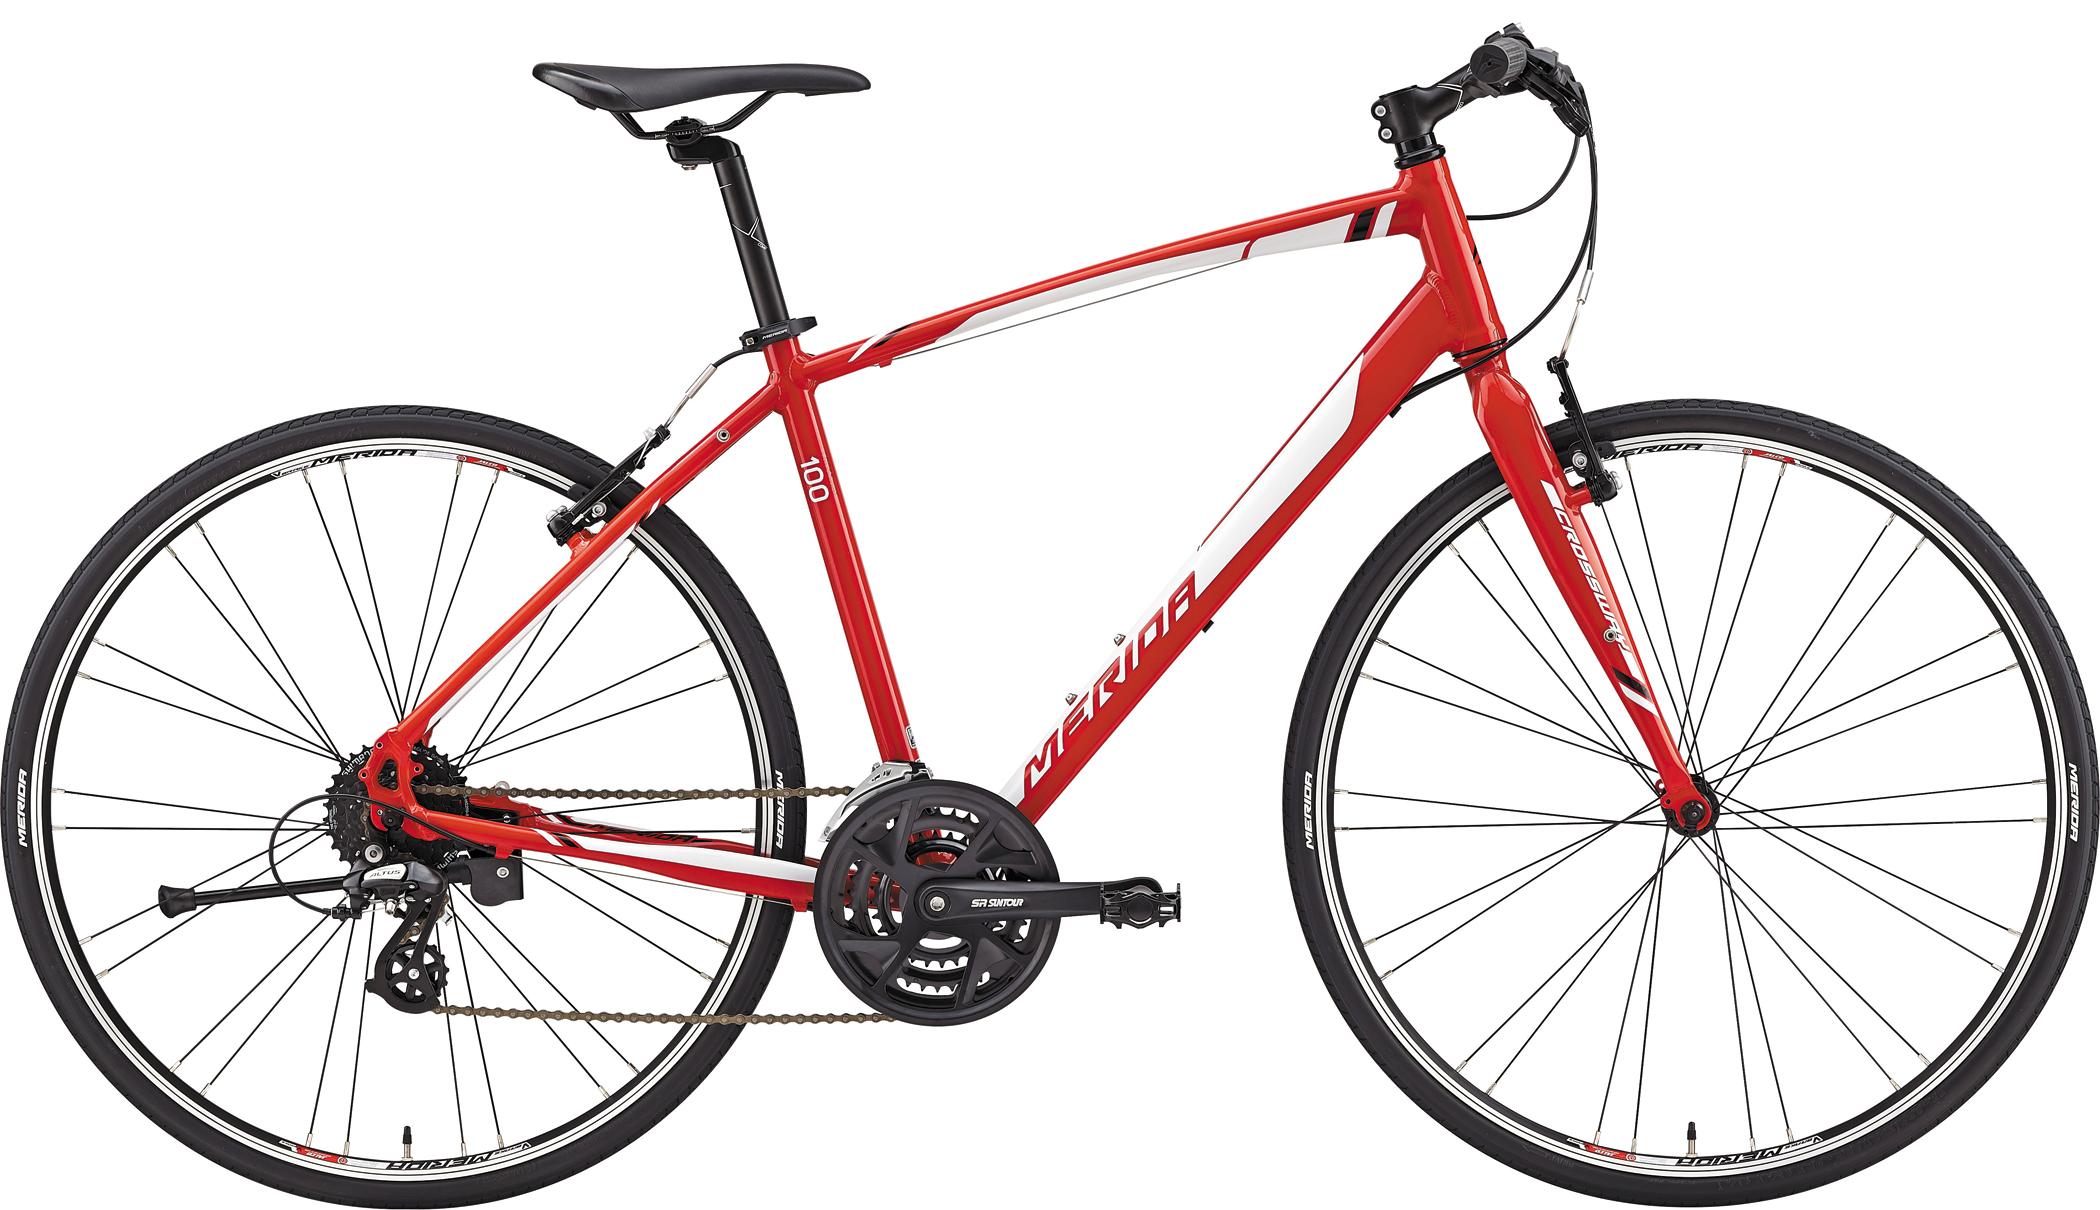 crossbike_roadbike_merit-150x150